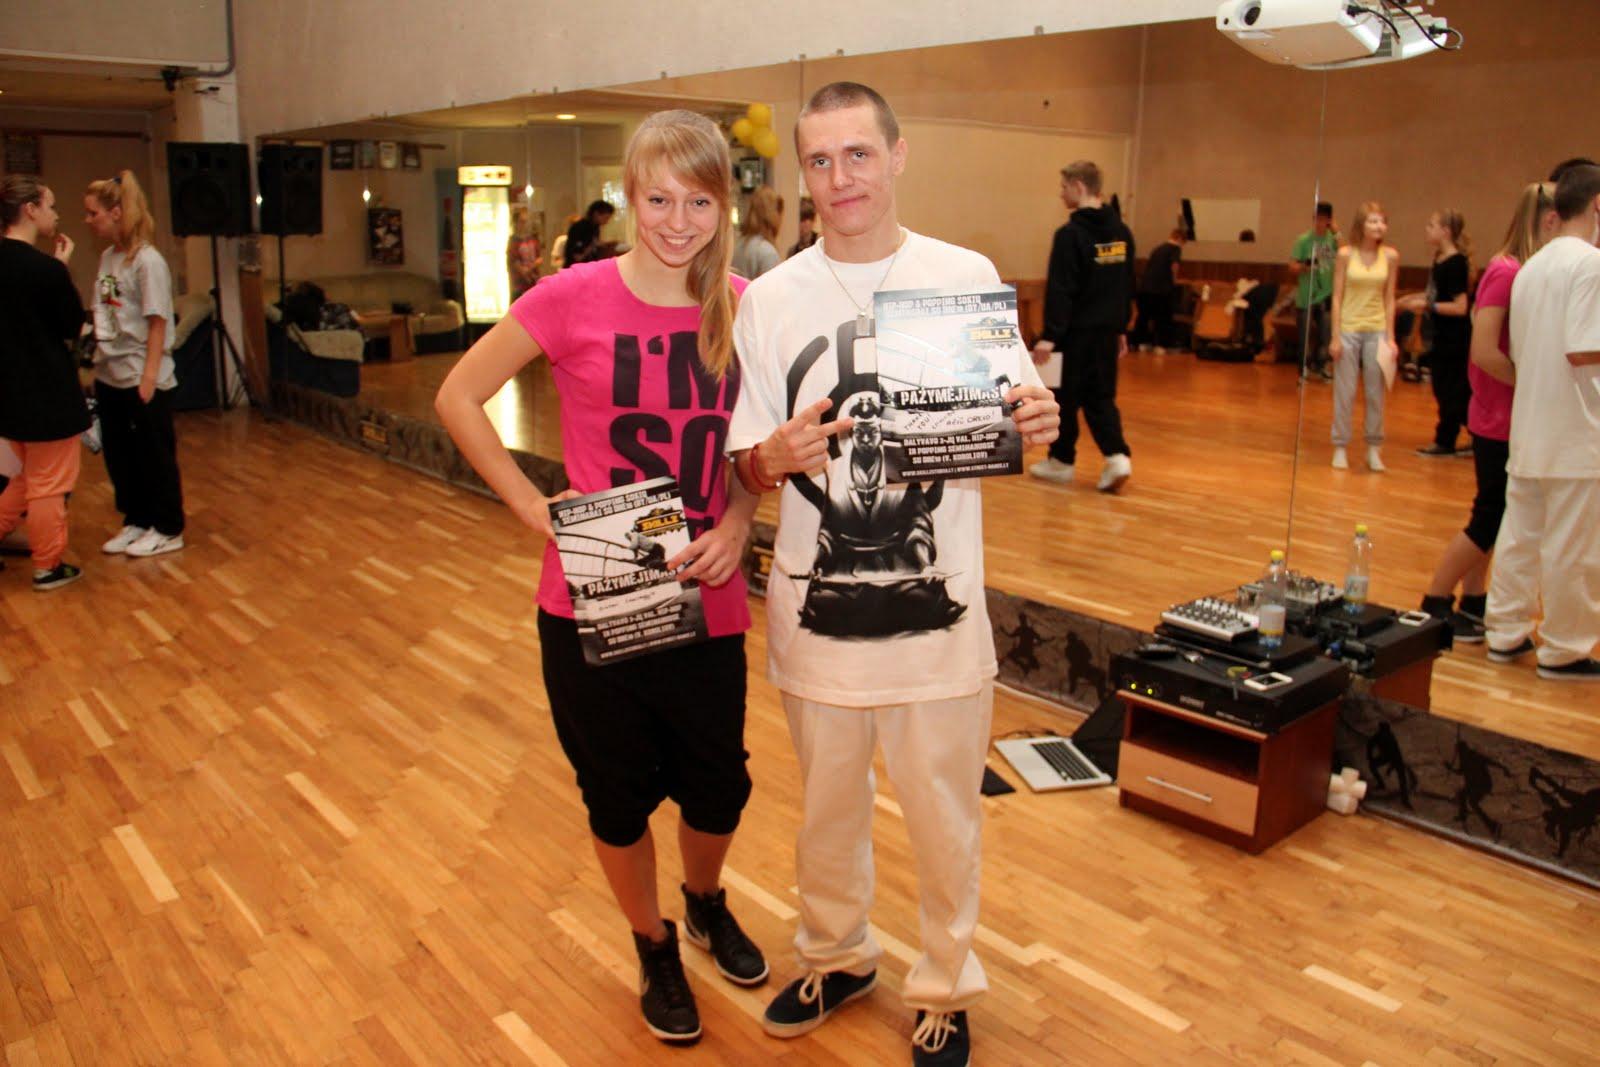 Dre10 Workshop @SKILLZ - IMG_5749.JPG